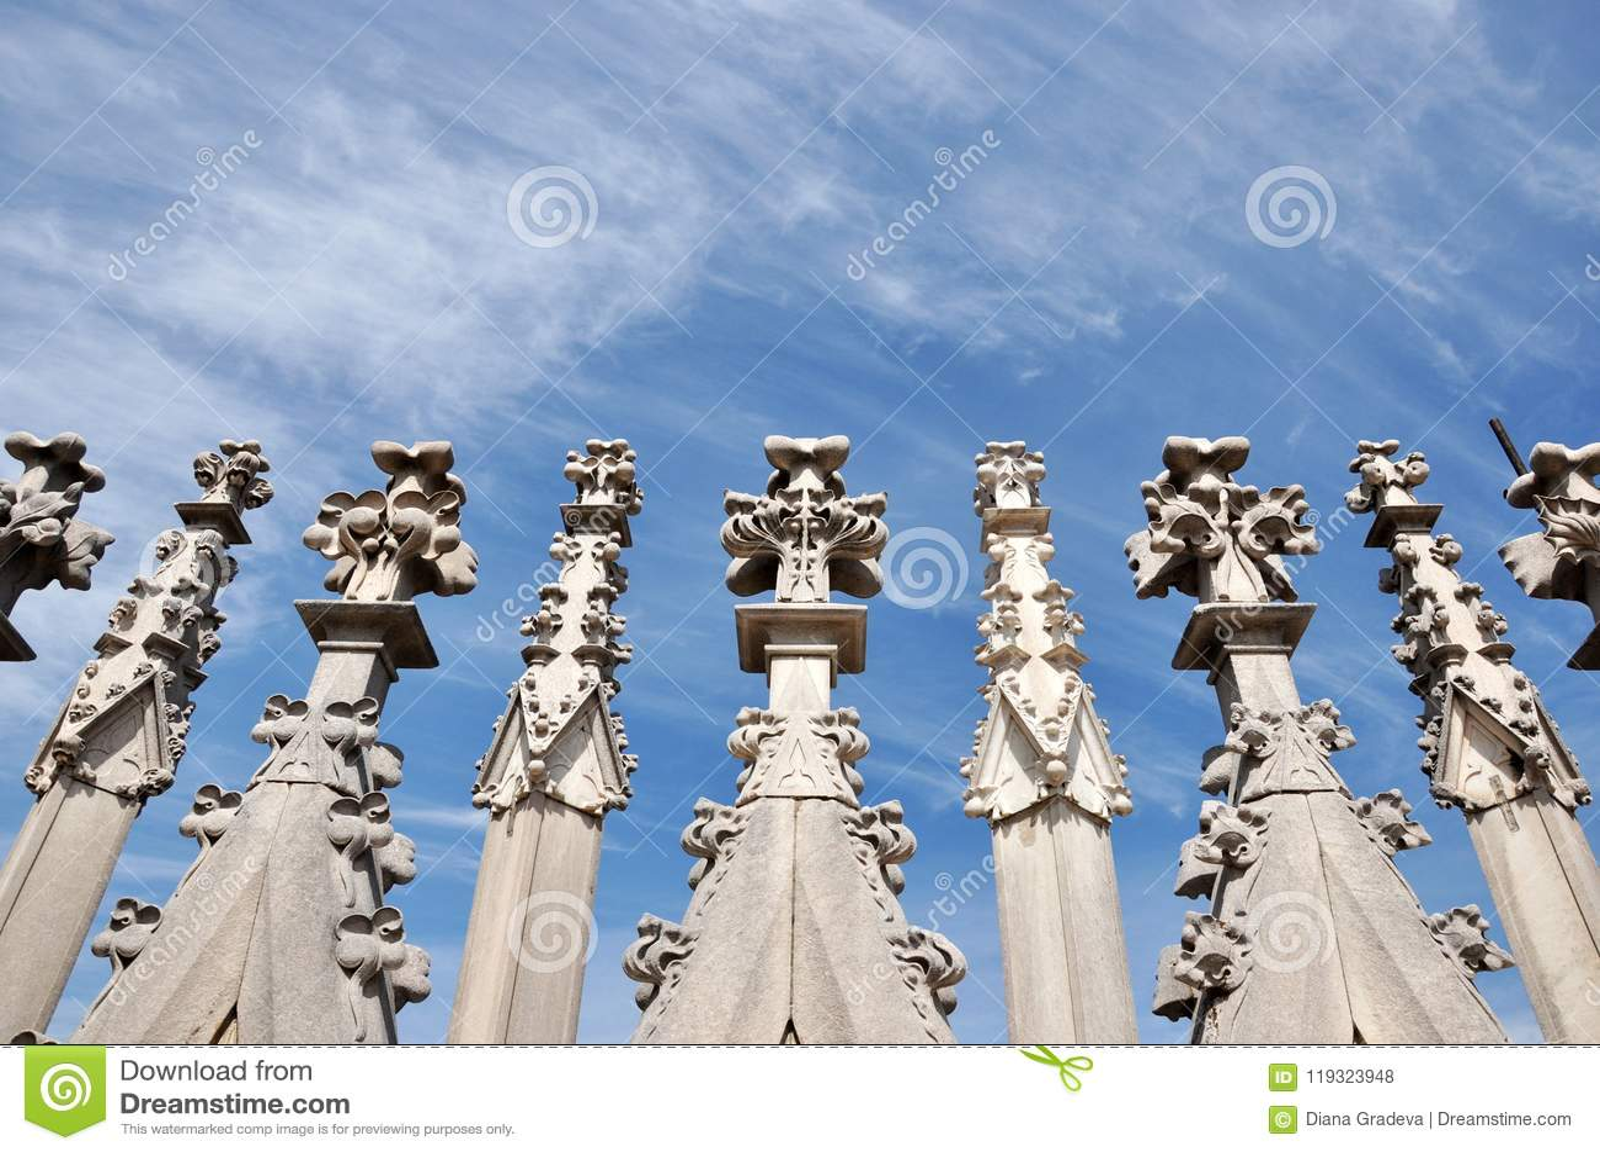 The Roof of Duomo Di MIlano